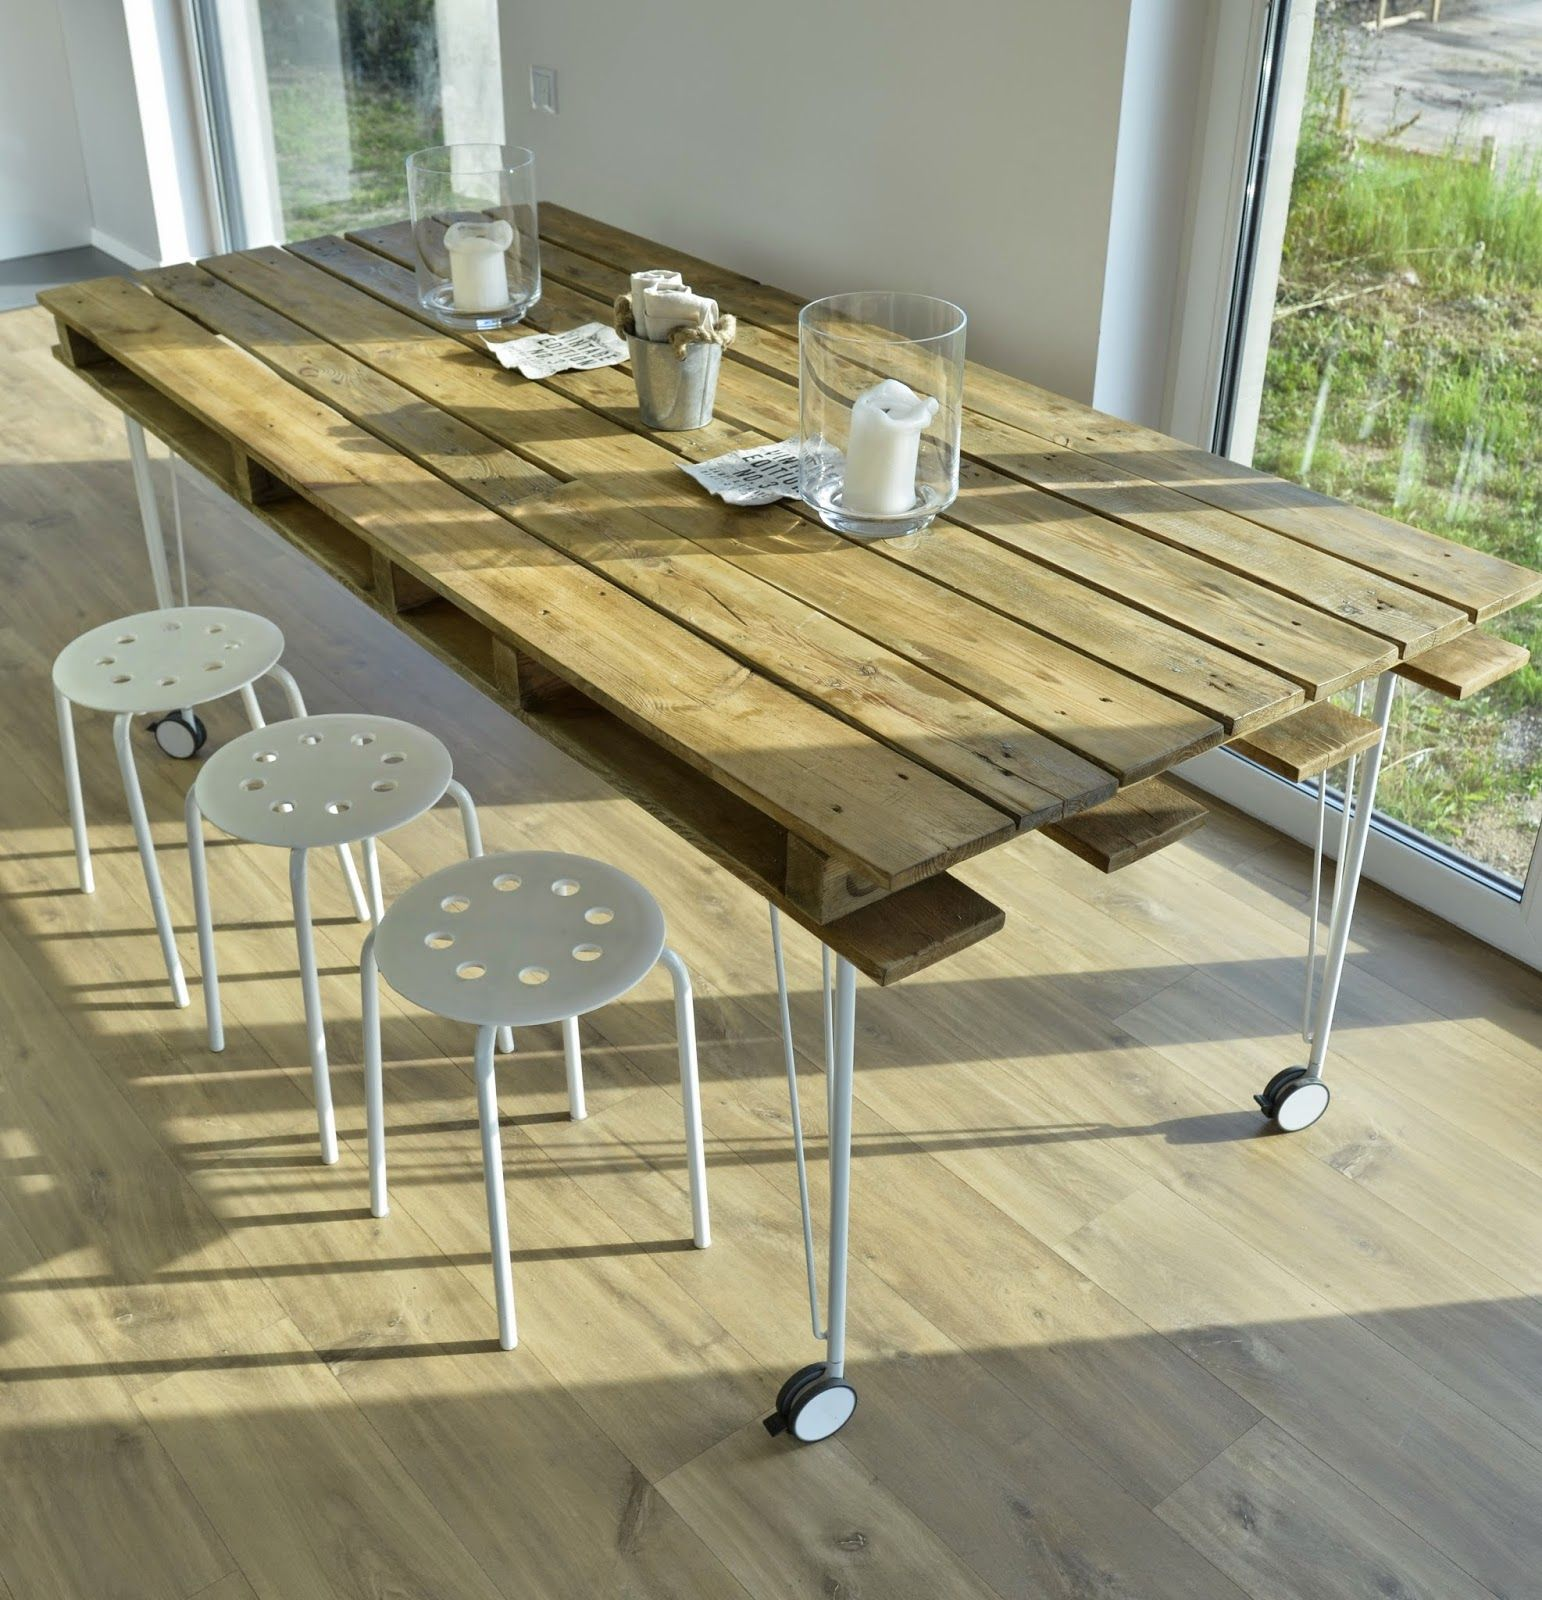 Ideas Book Diy Pallet Dining Table Meja Palet Perabot Palet Dekor